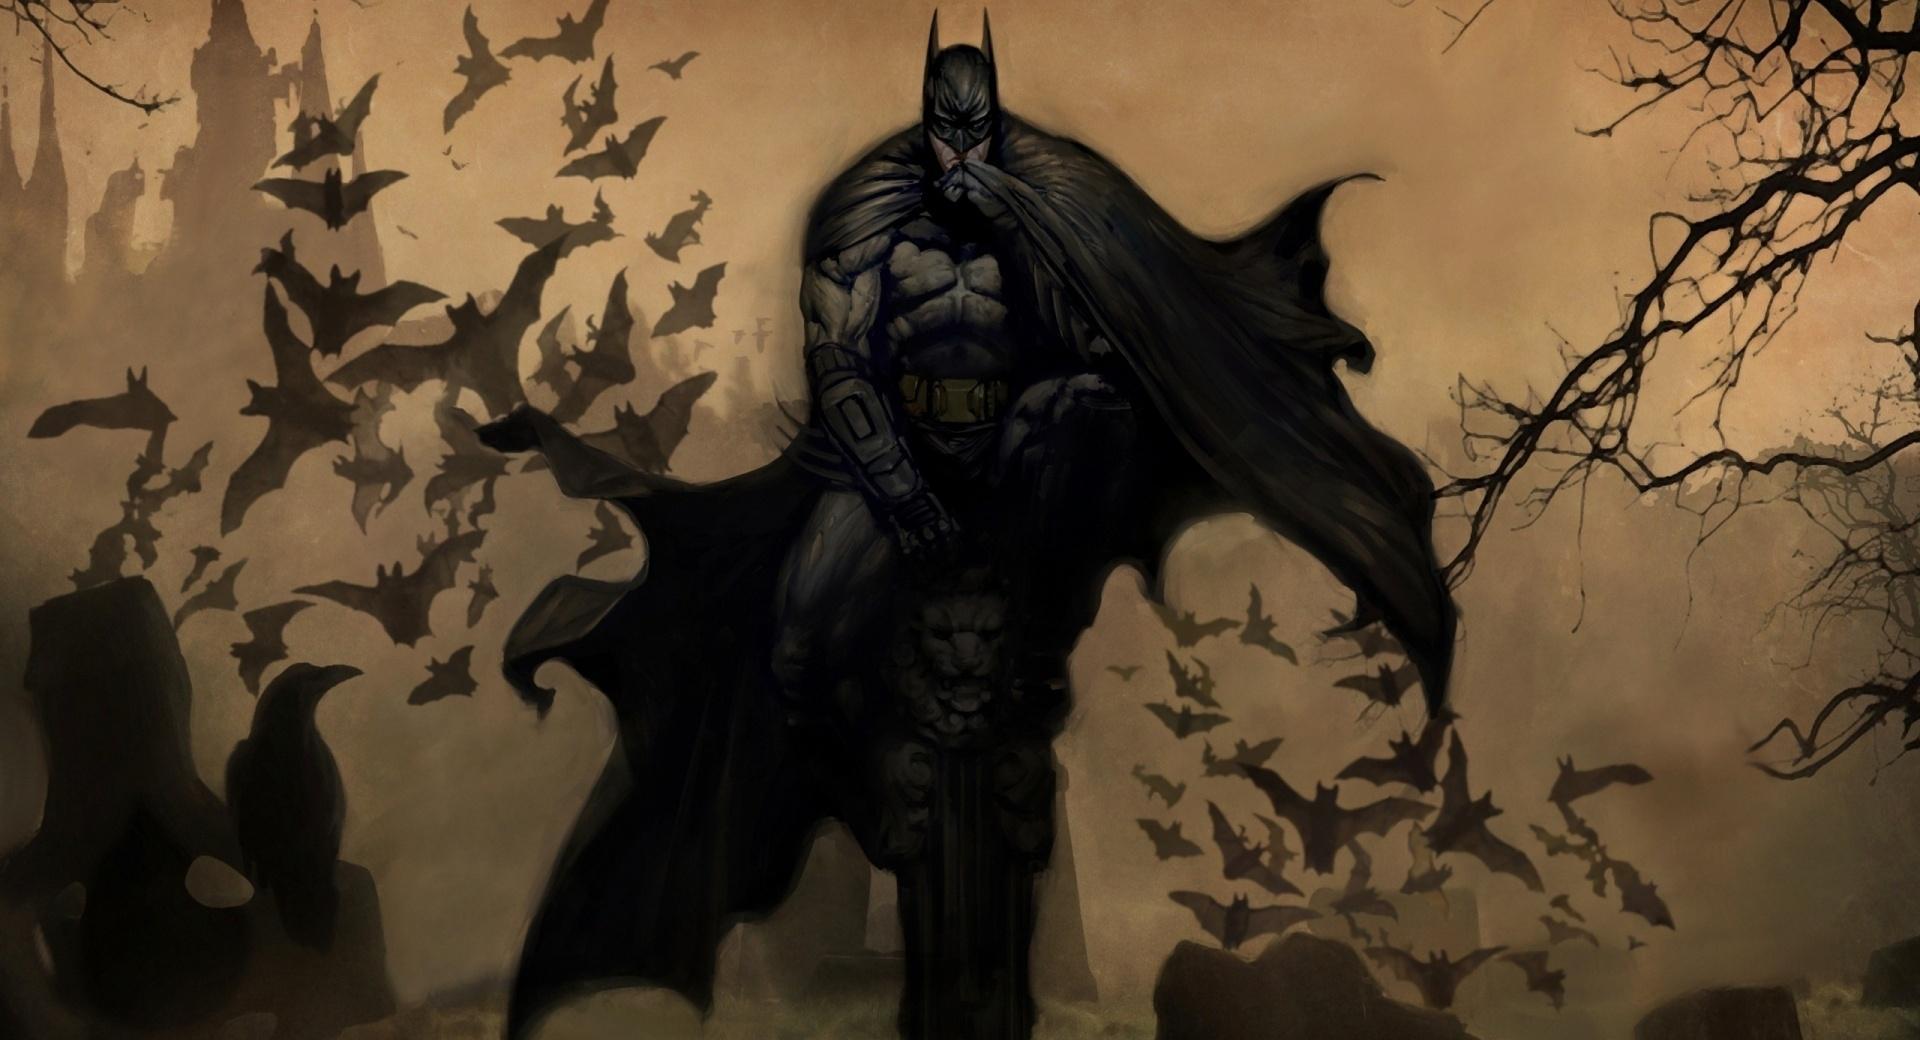 Batman Drawing wallpapers HD quality